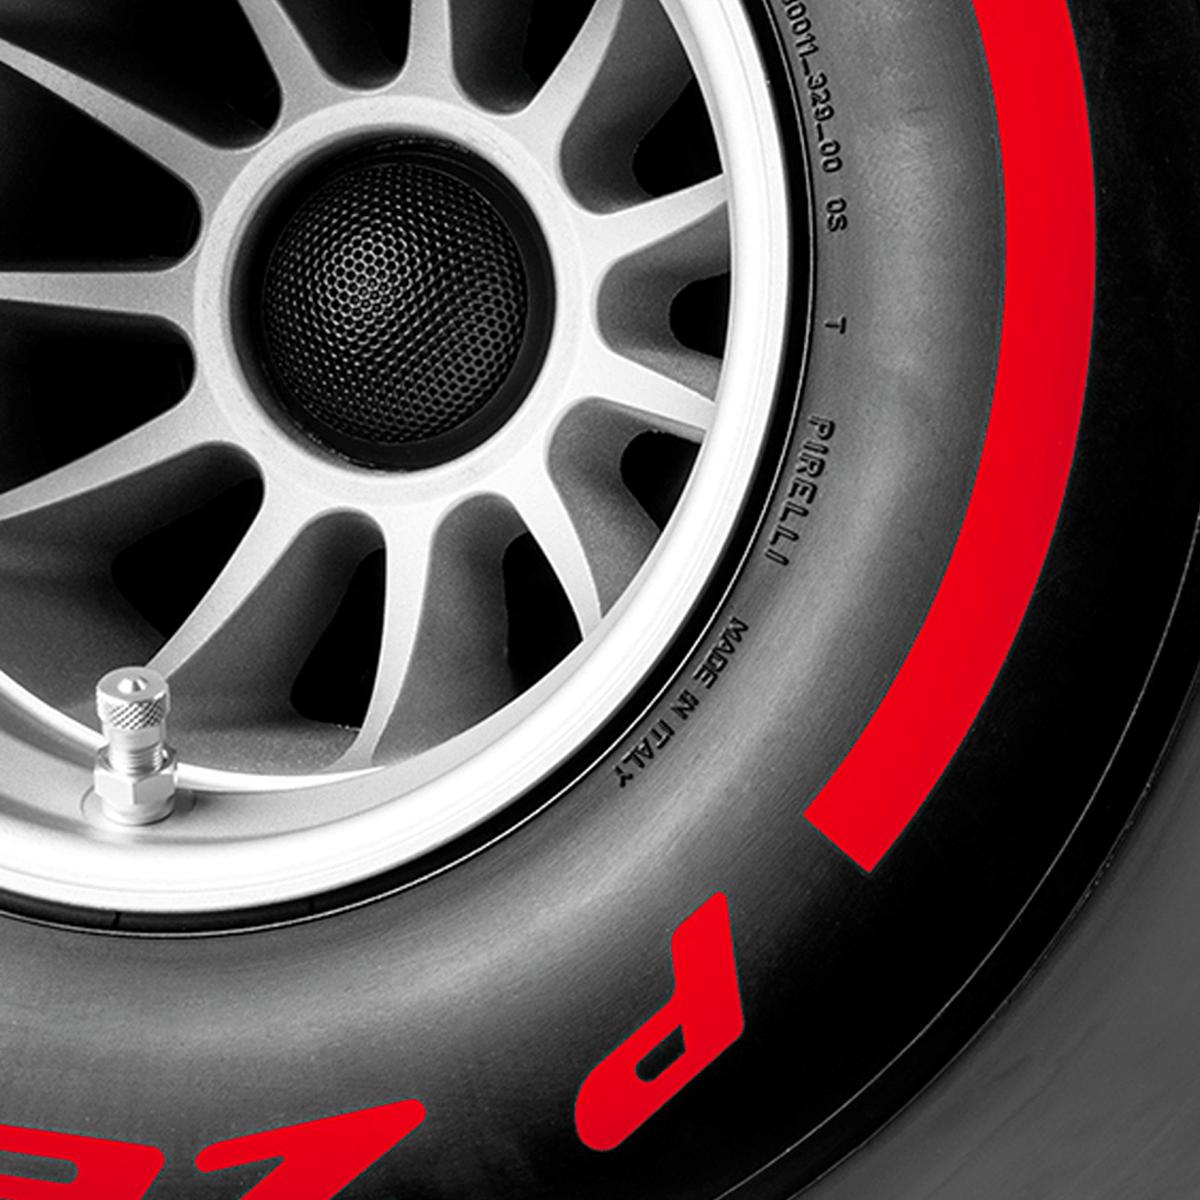 Pirelli P ZERO™ casse audio Bluetooth colore rosso